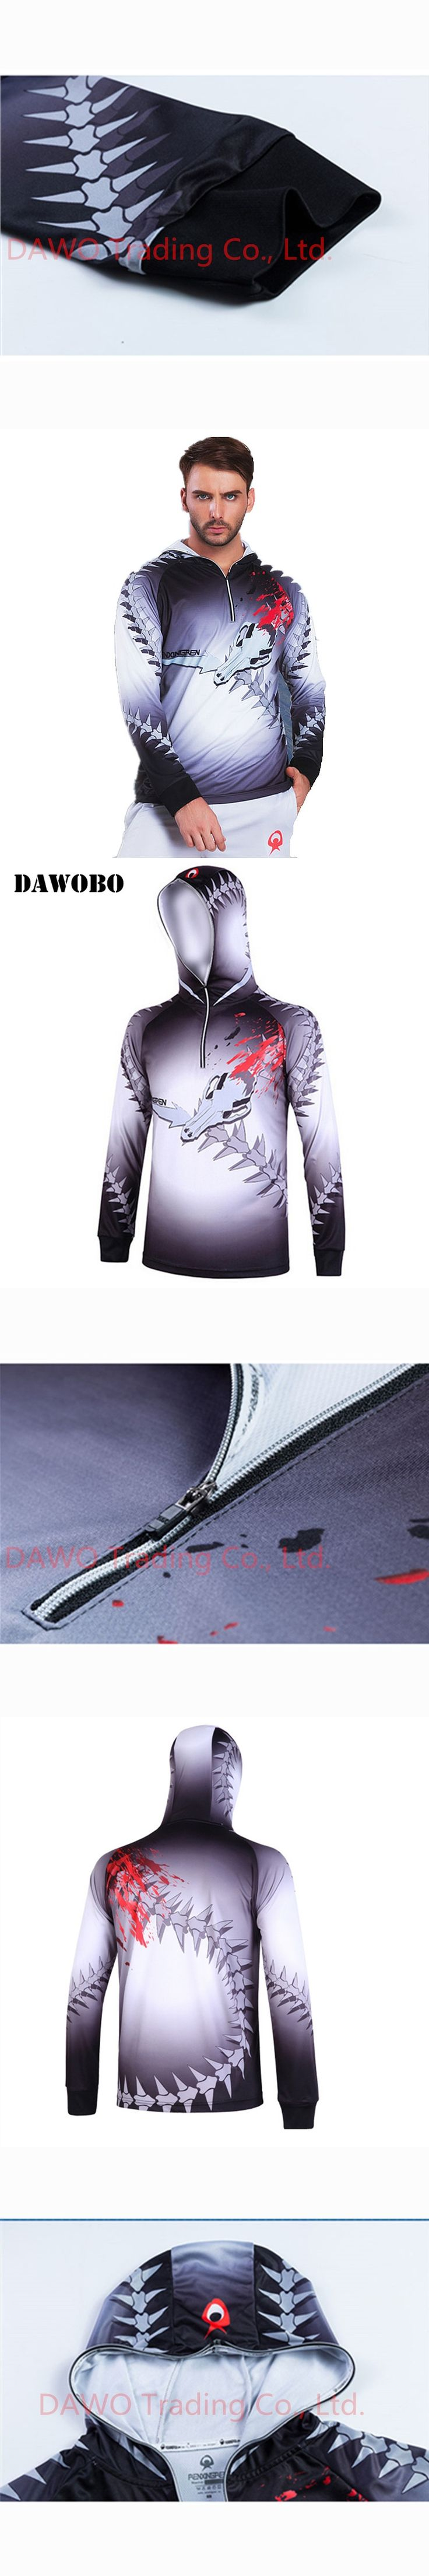 2017 Summer style Men/Women Autumn outdoor wear fishing suit men's breathable sunscreen UV anti-wrinkle hooded fishing shirt